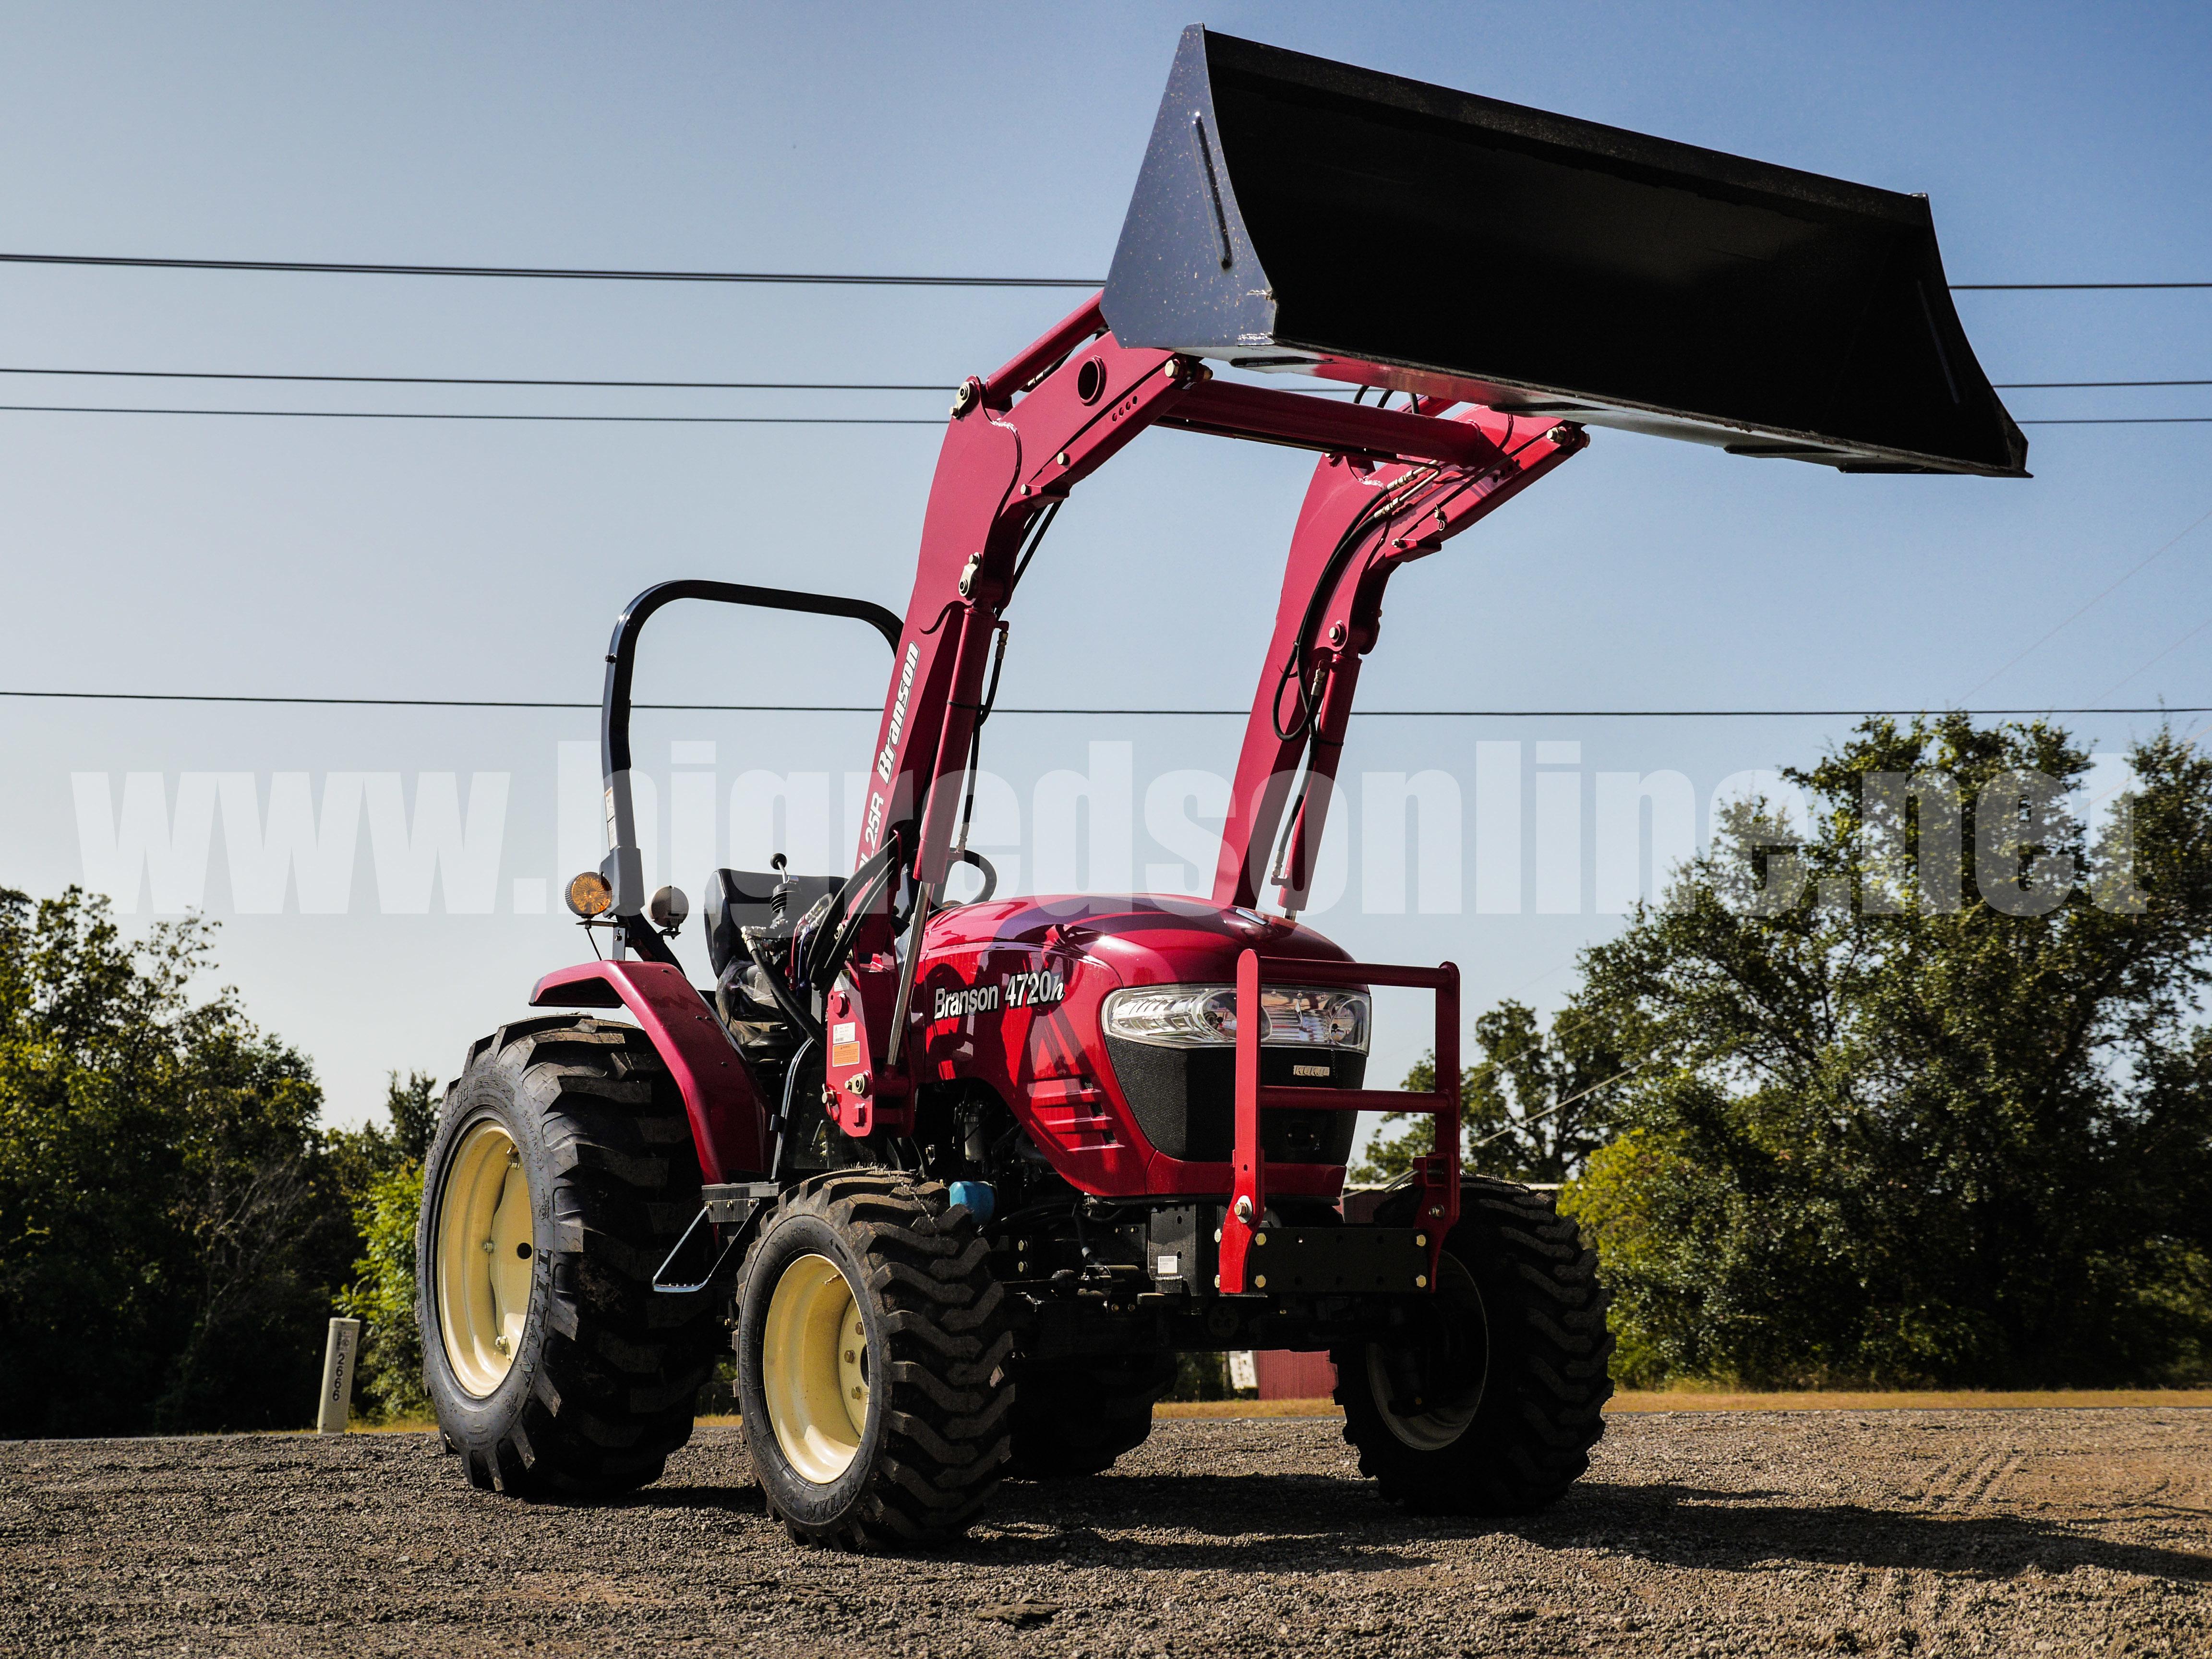 Big Red S Equipment Sales Granbury Tx Goo Gl 7u0jrb